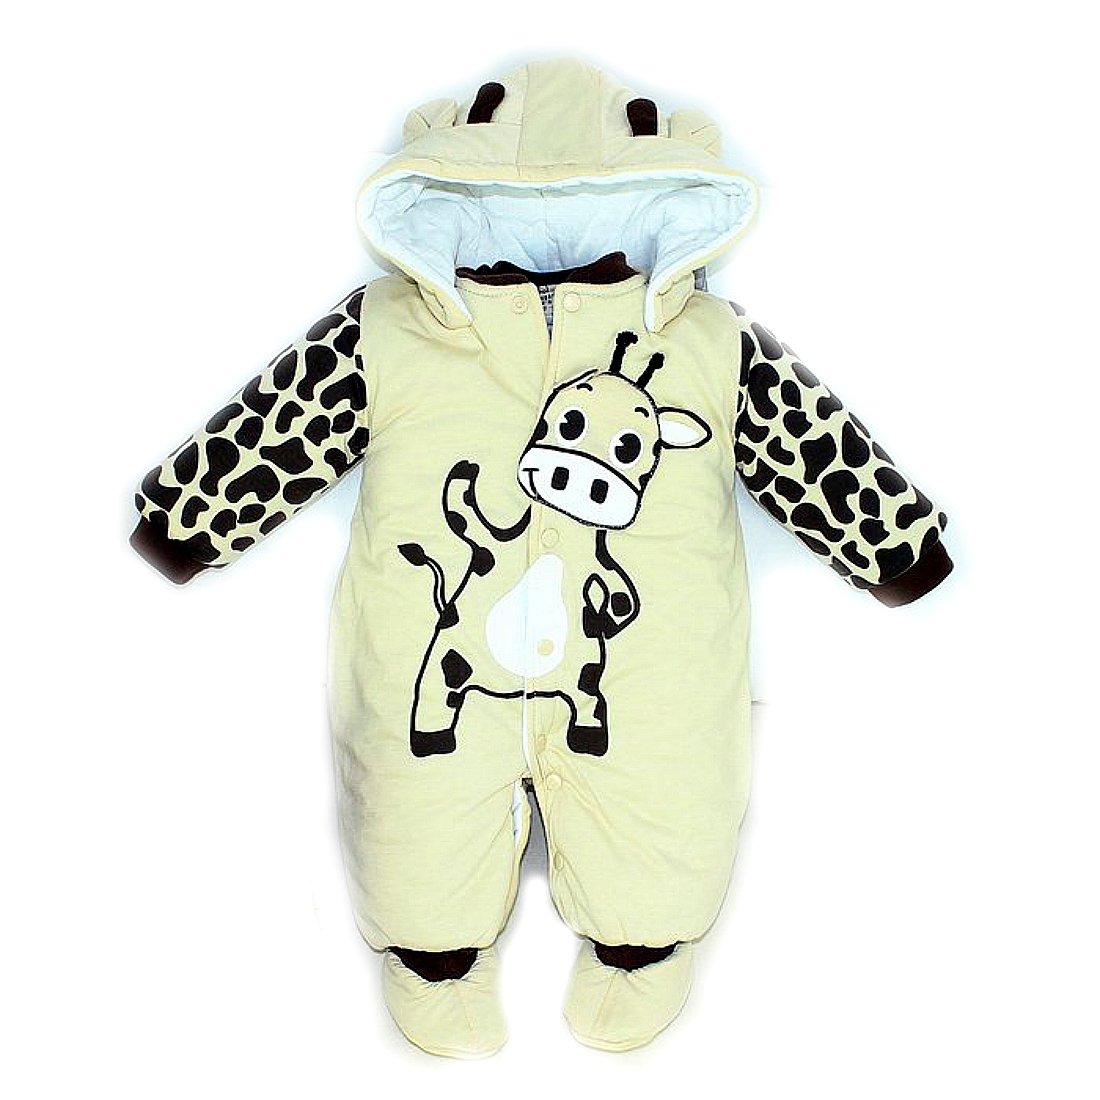 SOPO Giraffe Baby Boy Girl Winter Romper Christmas Newborn Winter Clothes 0-18m